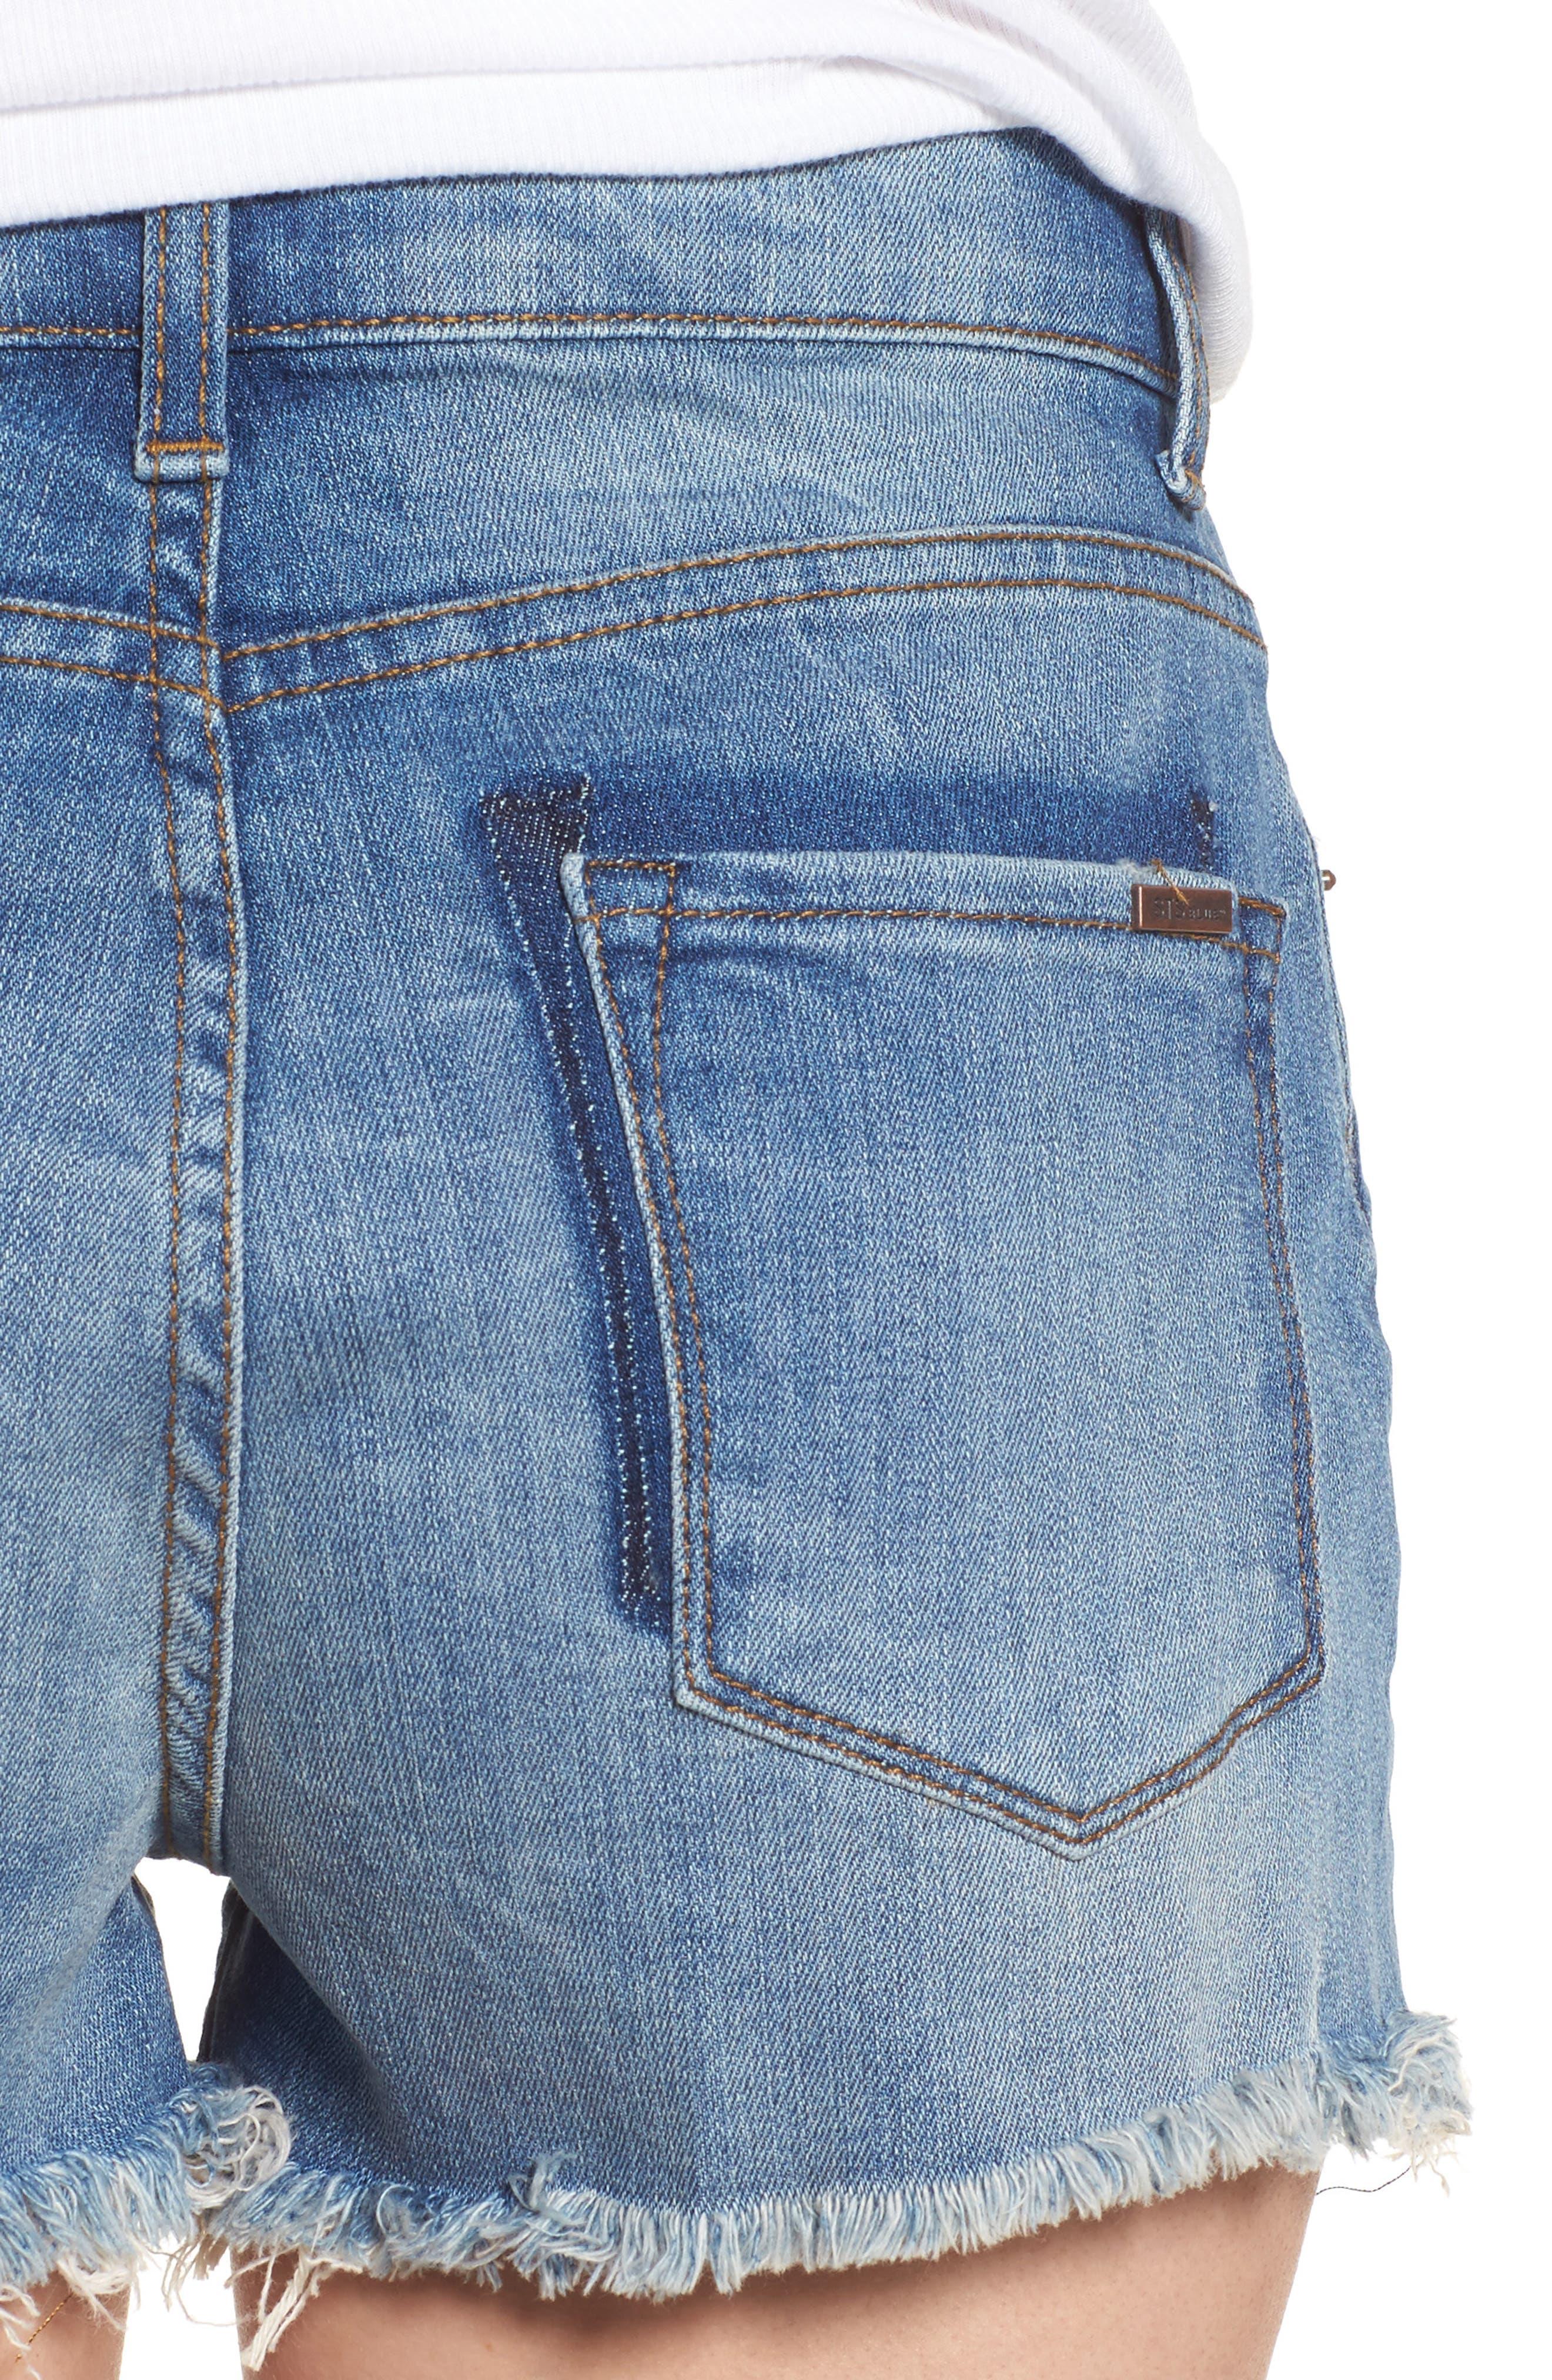 Rosebowl Shadow Pocket Denim Shorts,                             Alternate thumbnail 4, color,                             403